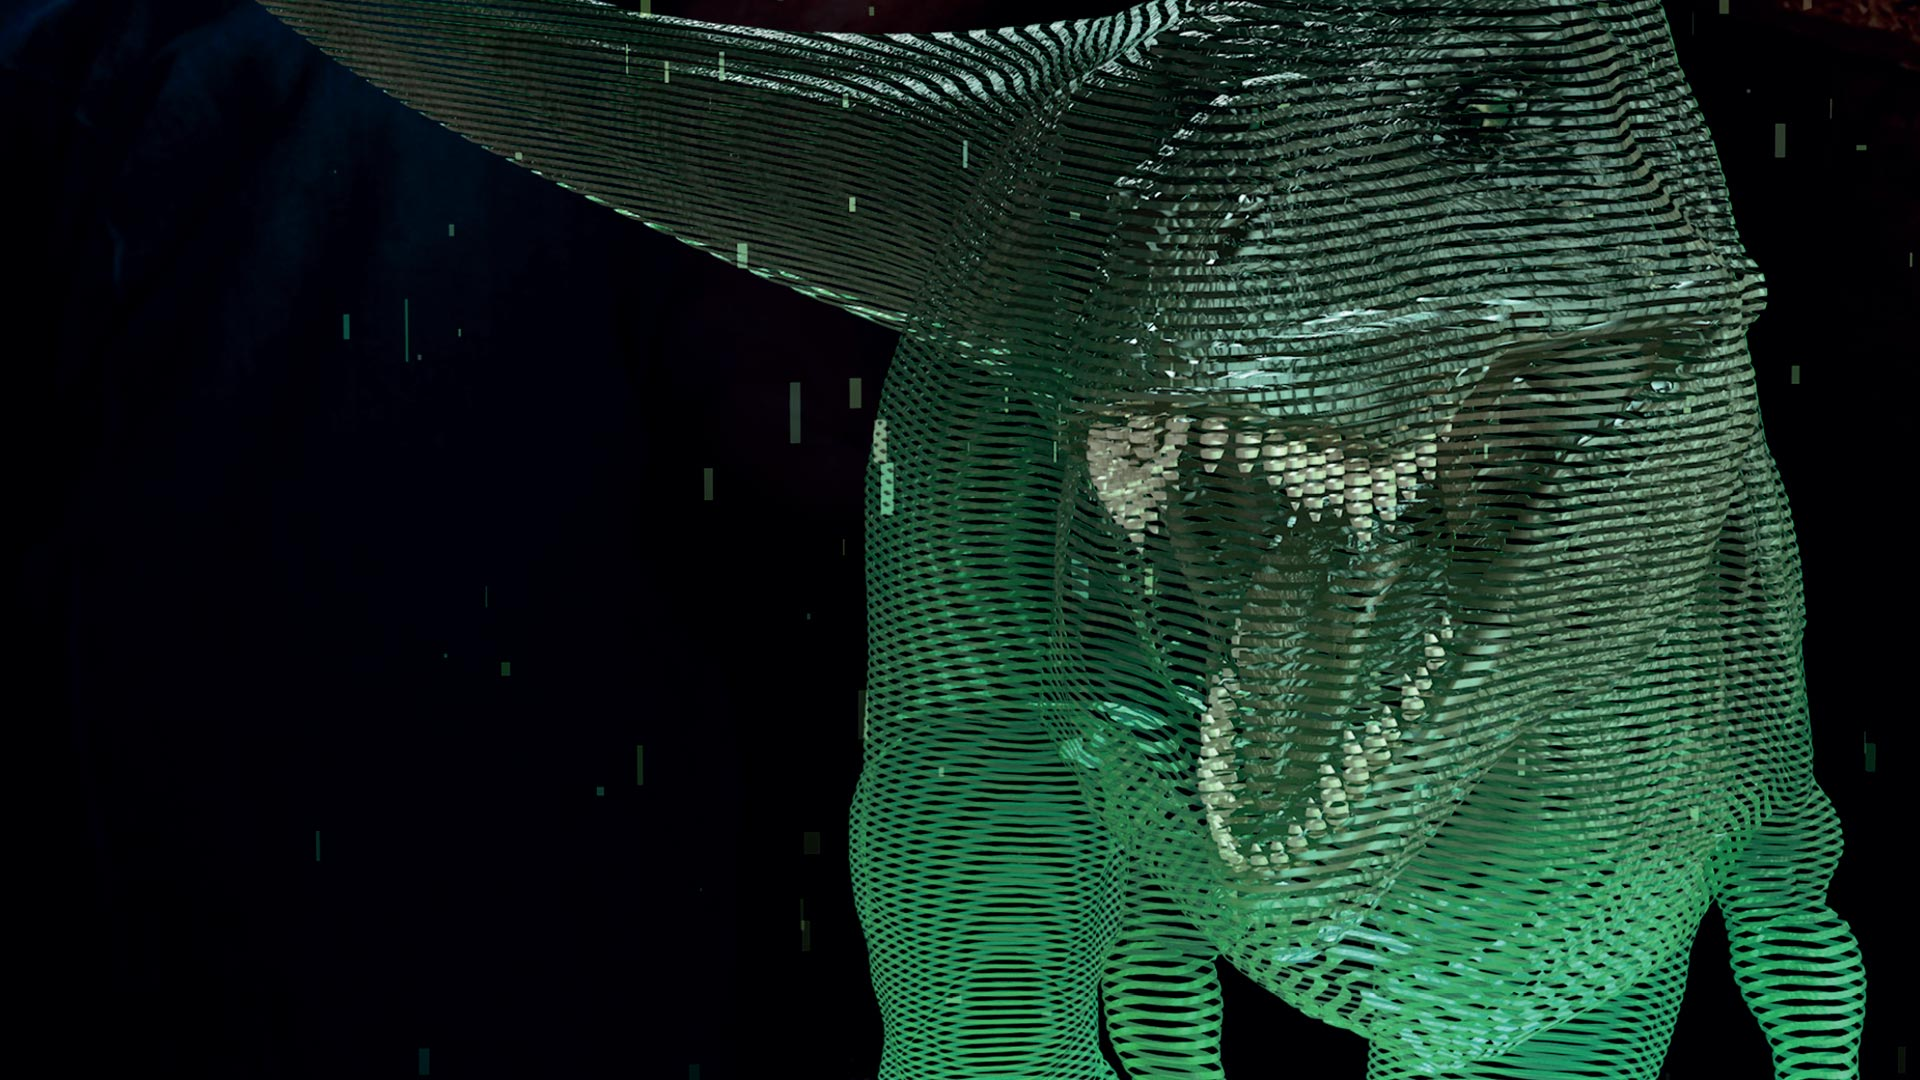 ferran-amagat-lg-poster-3d-design-soundbar-trex-hologram